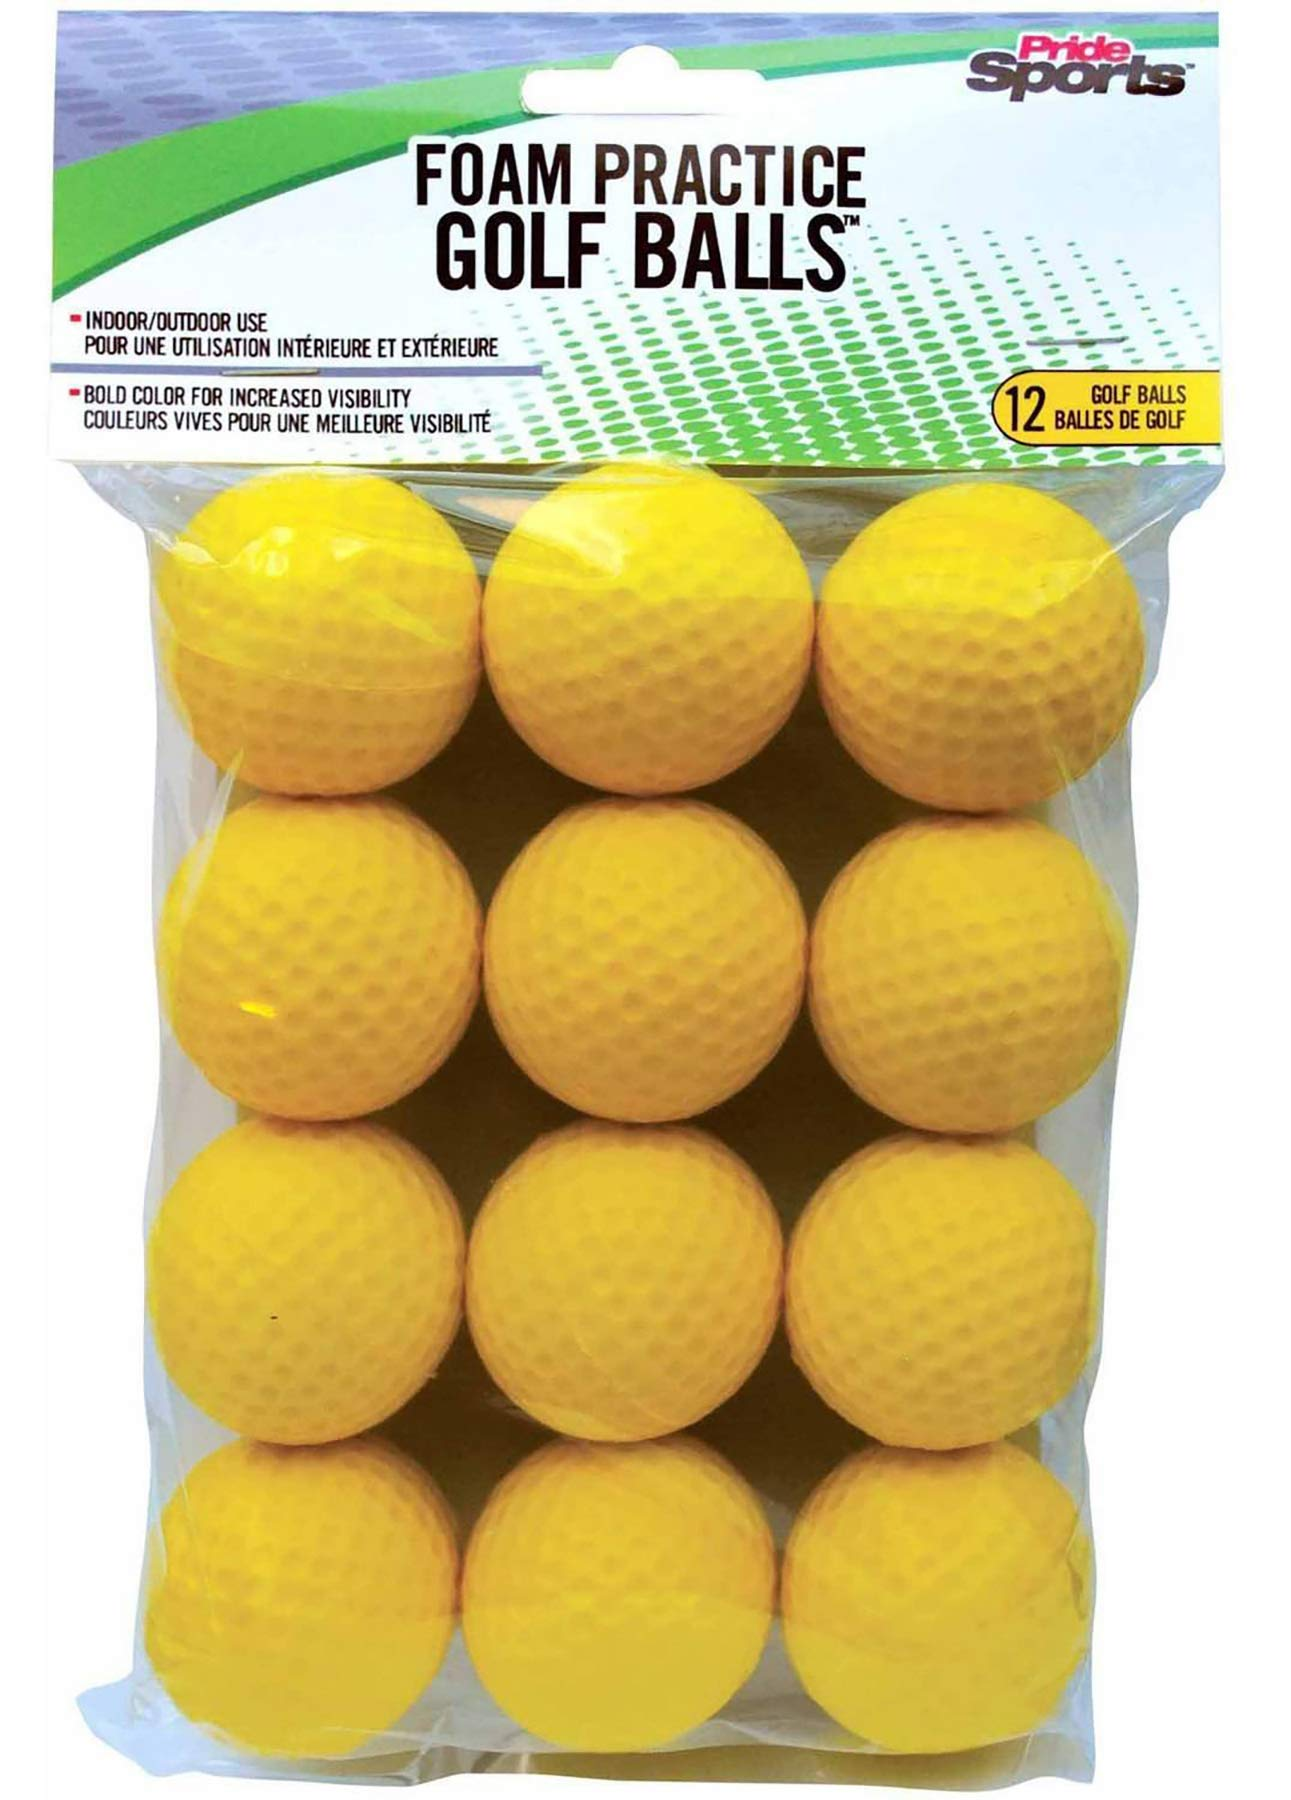 PrideSports Practice Golf Balls, Foam, 12 Count, Yellow ...